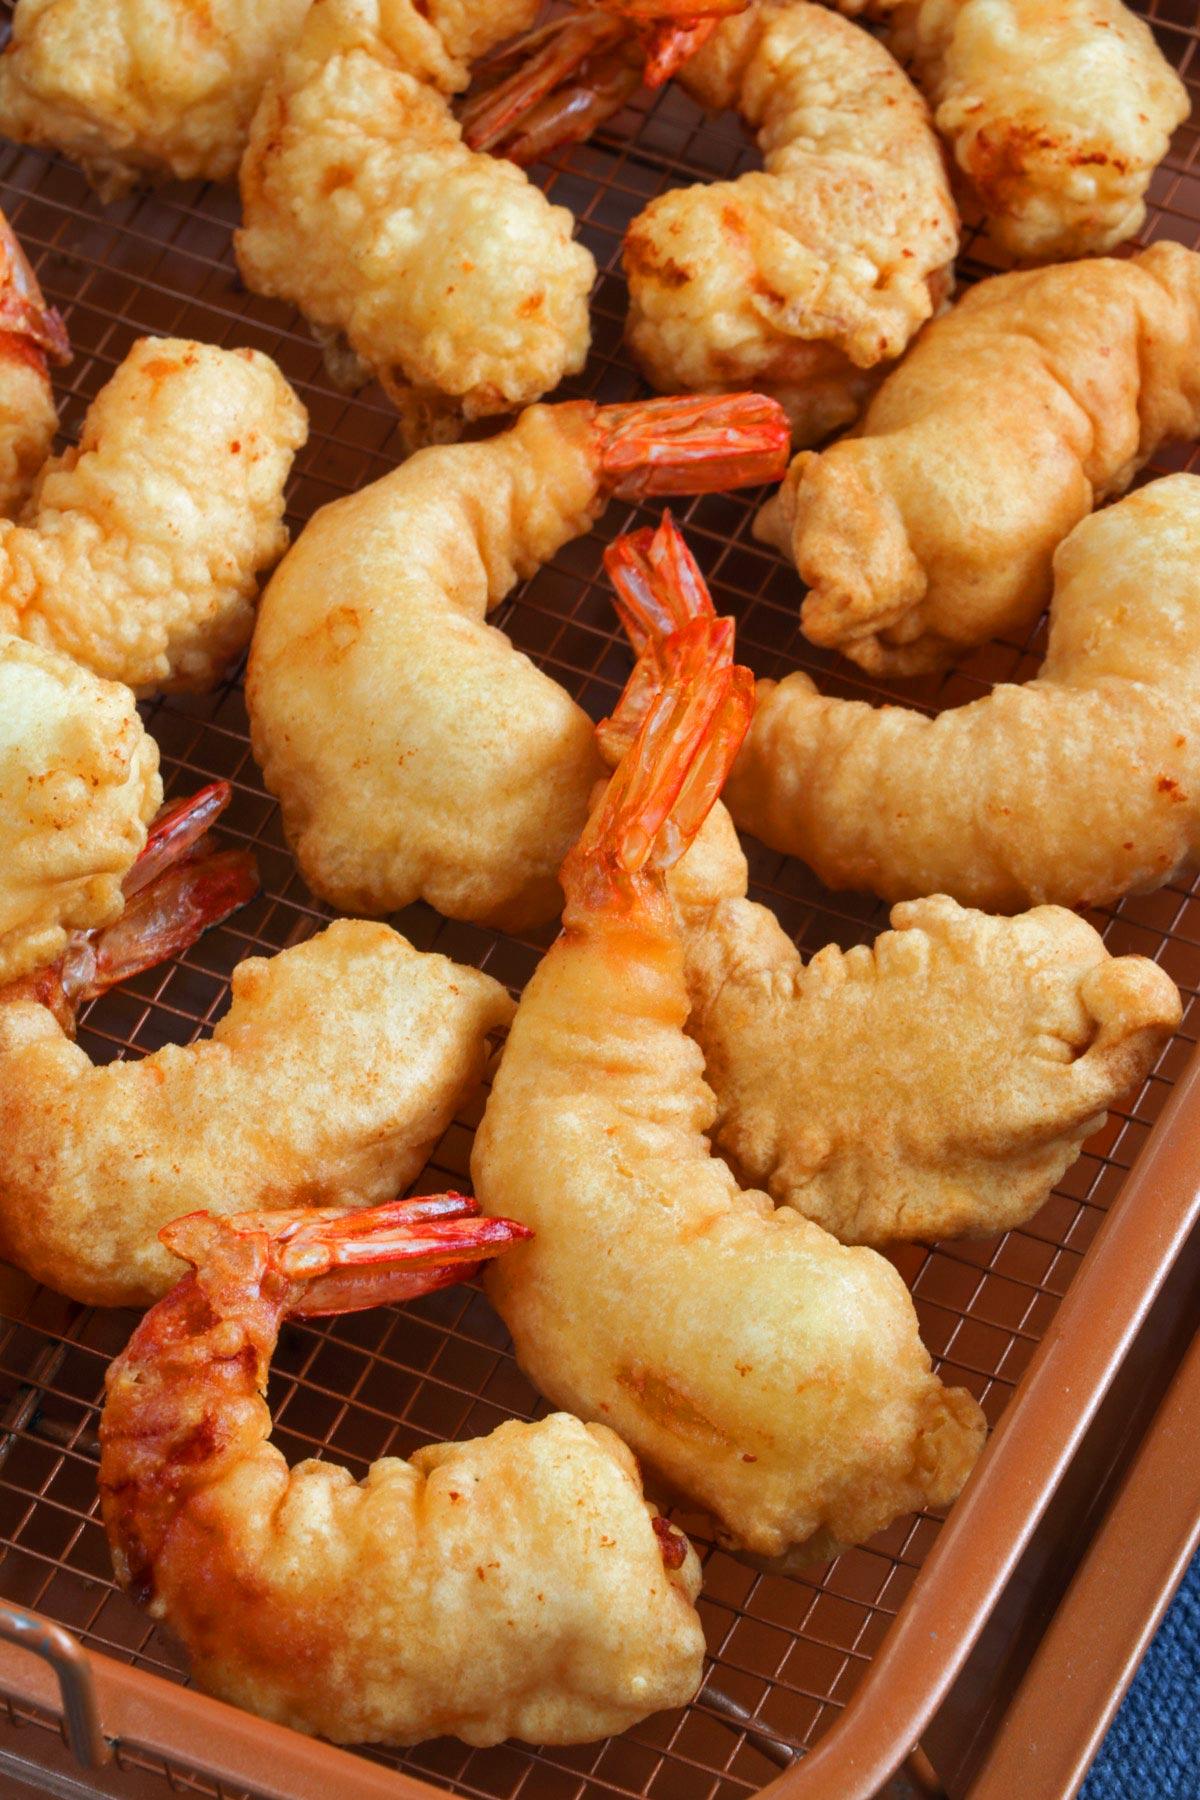 Crispy fried battered shrimp.